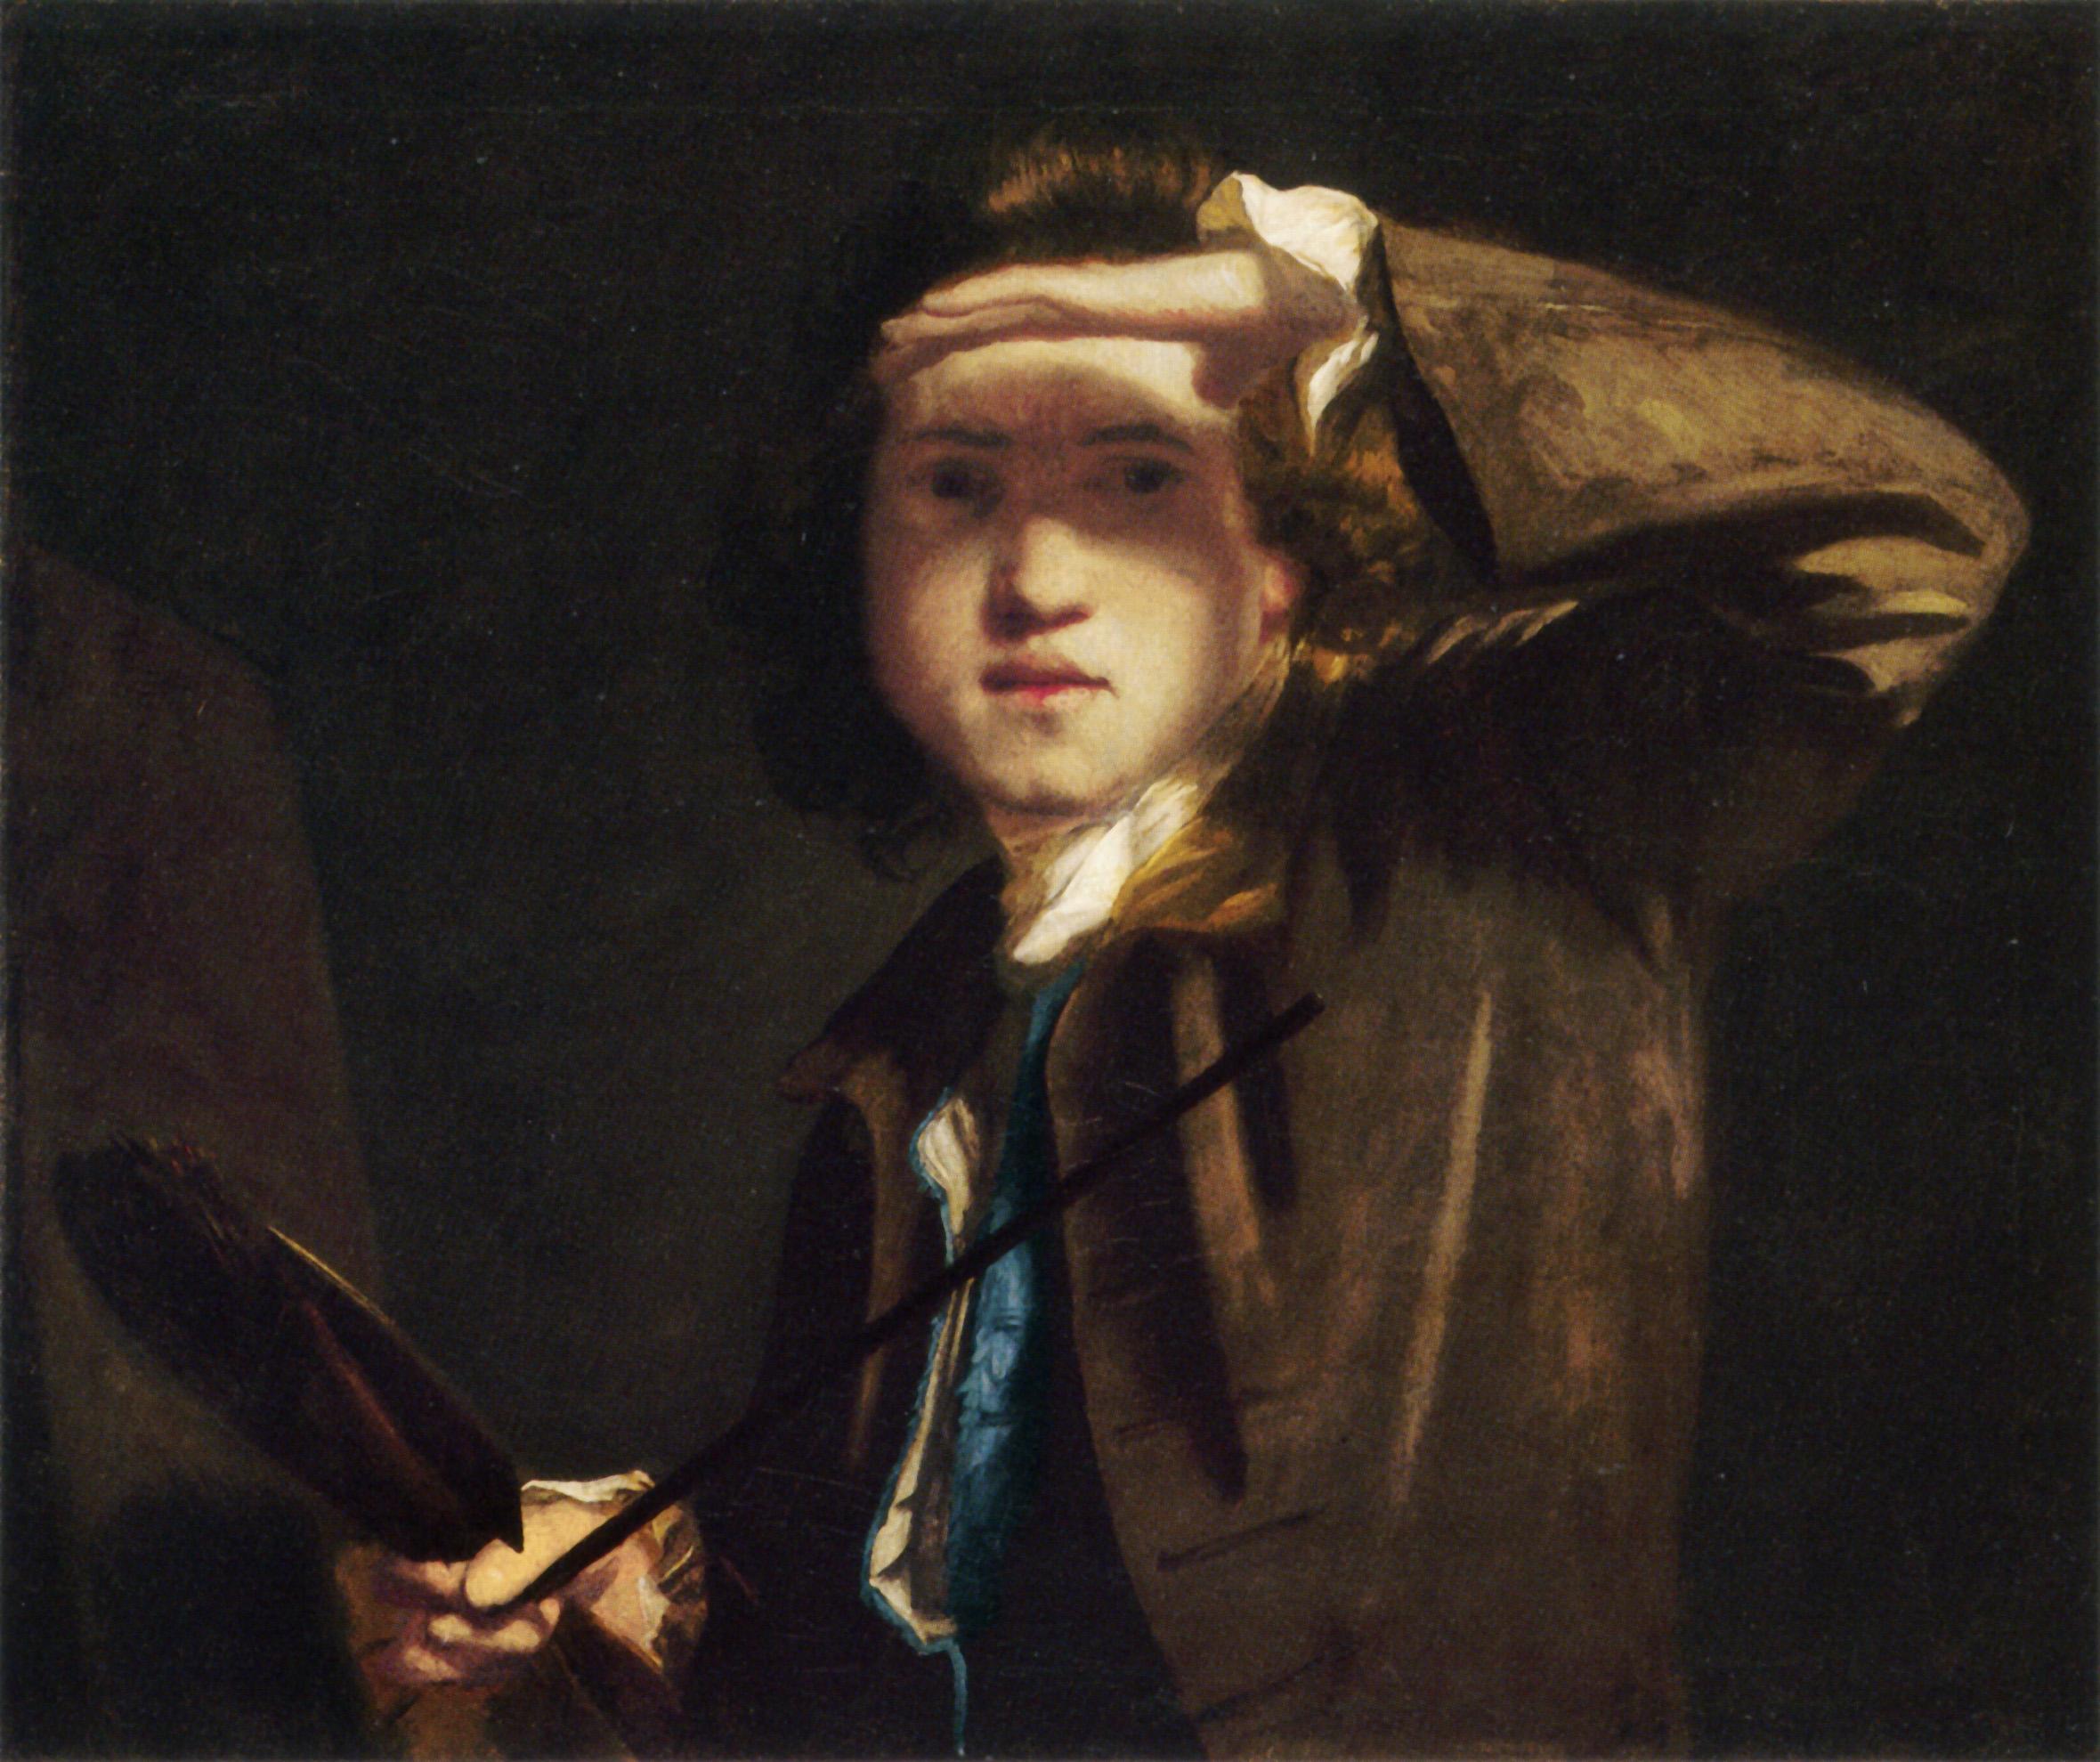 Reynolds, Self-portrait. 1747-9 [via Wikimedia Commons]